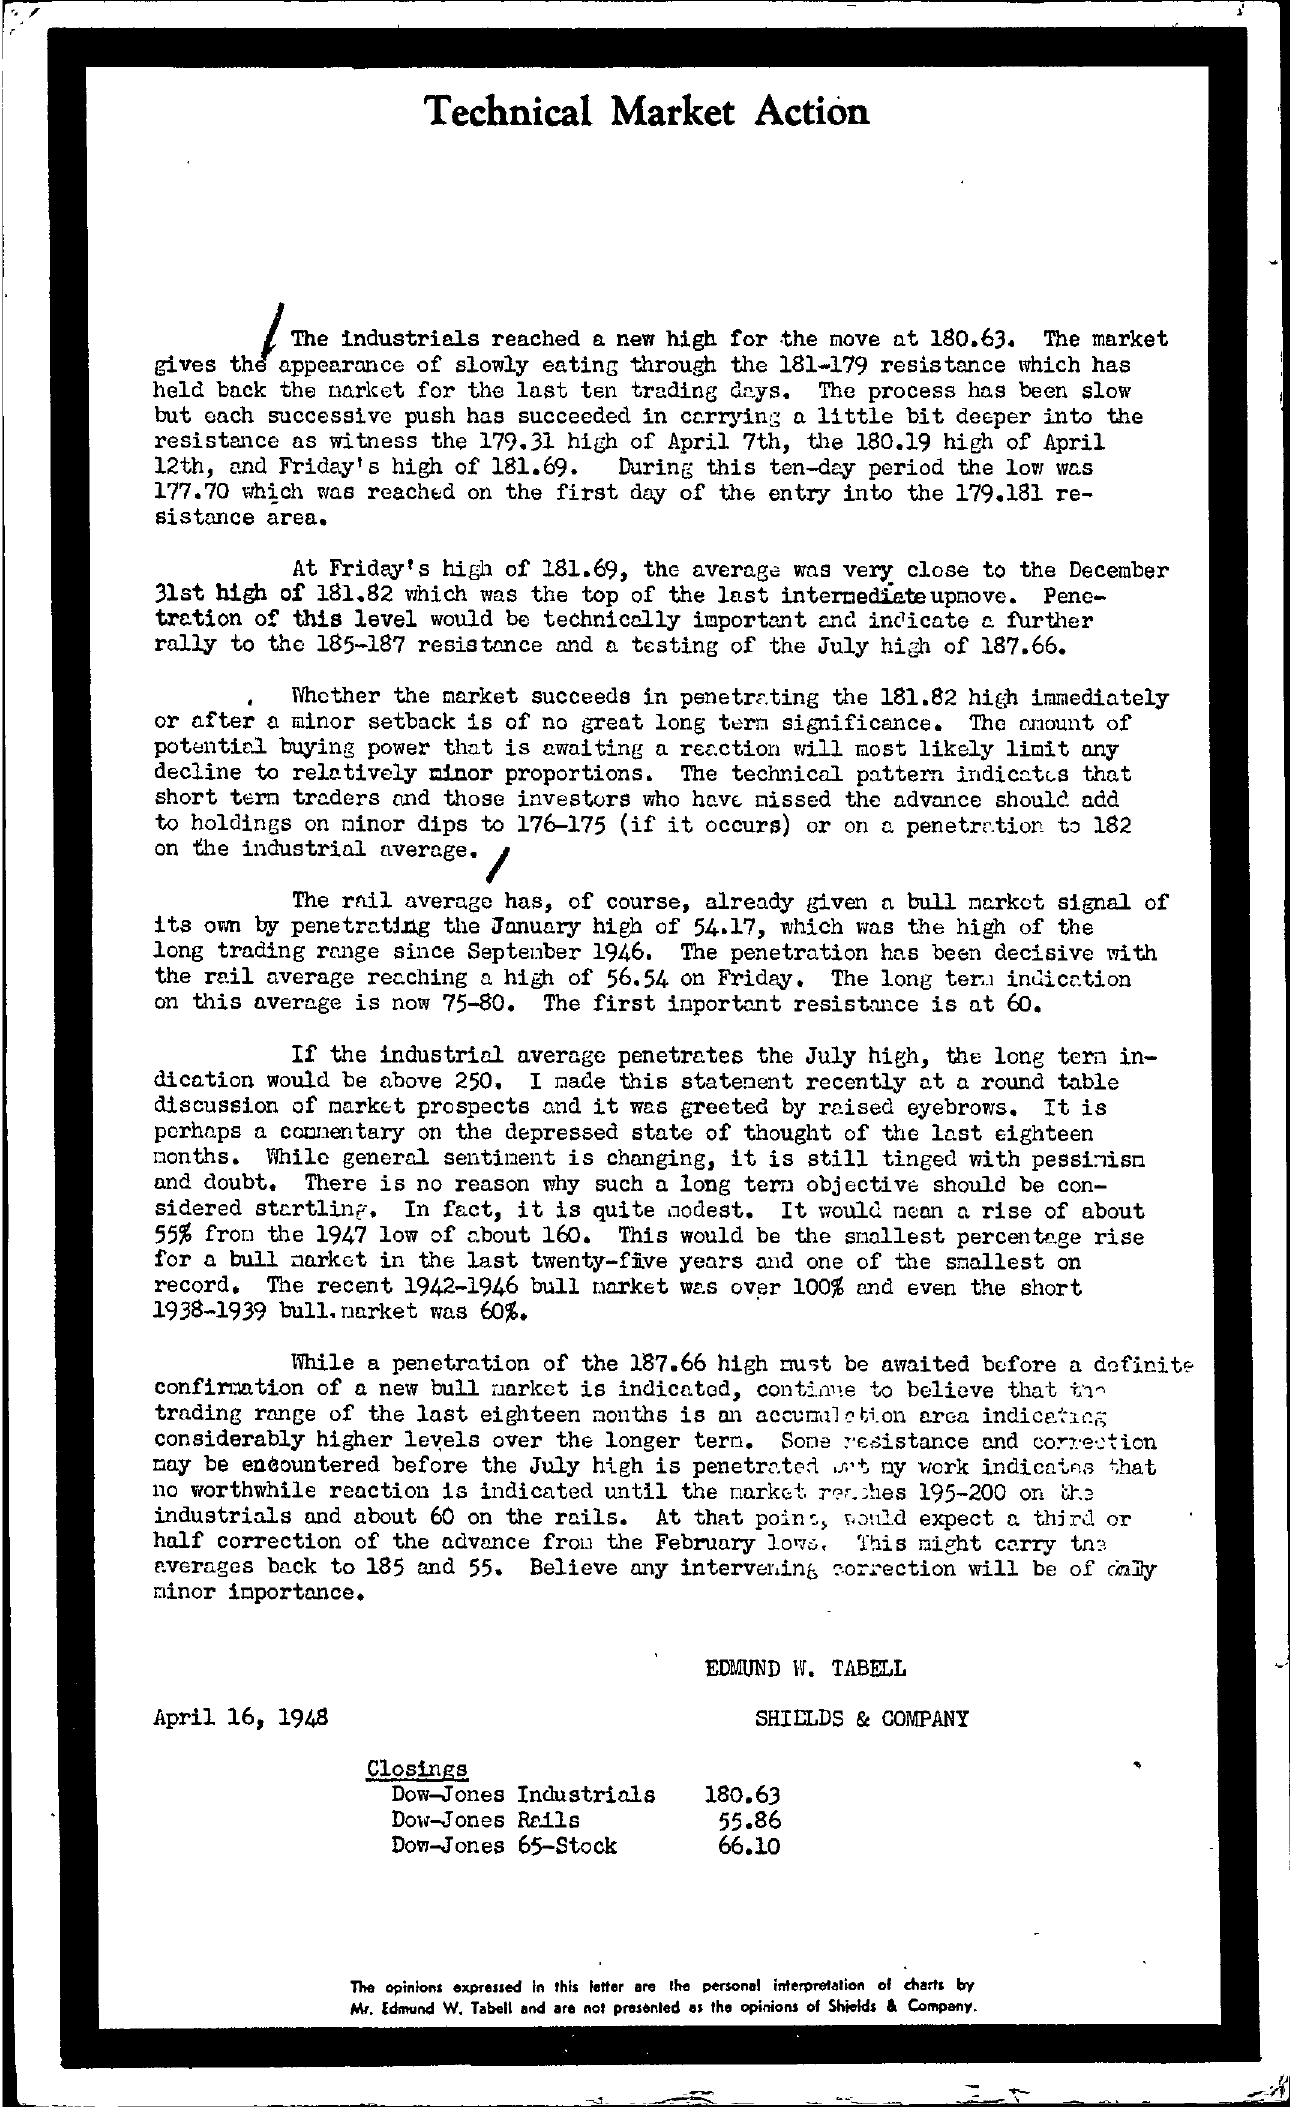 Tabell's Market Letter - April 16, 1948